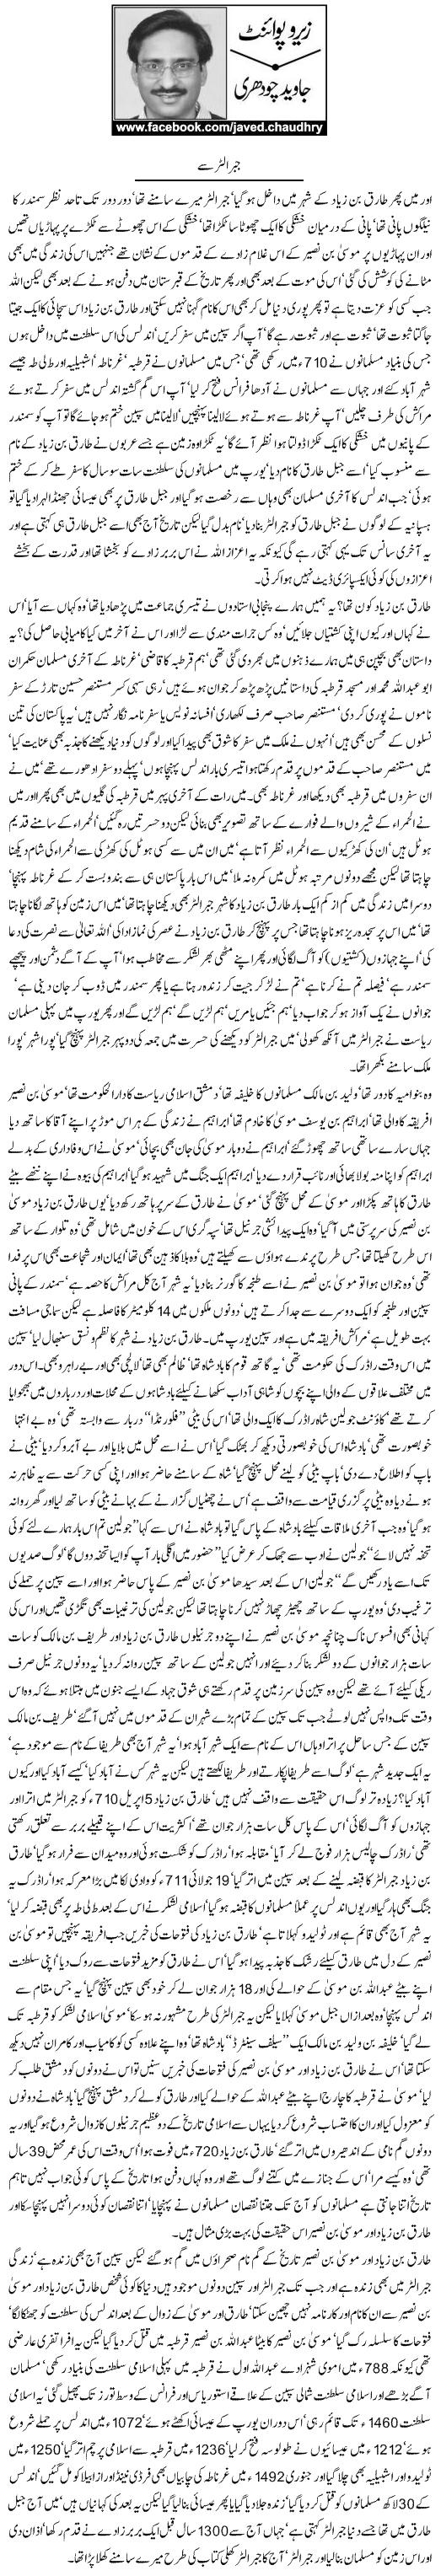 Javed Chaudhry Column   Gibraltar Say   Zero Point